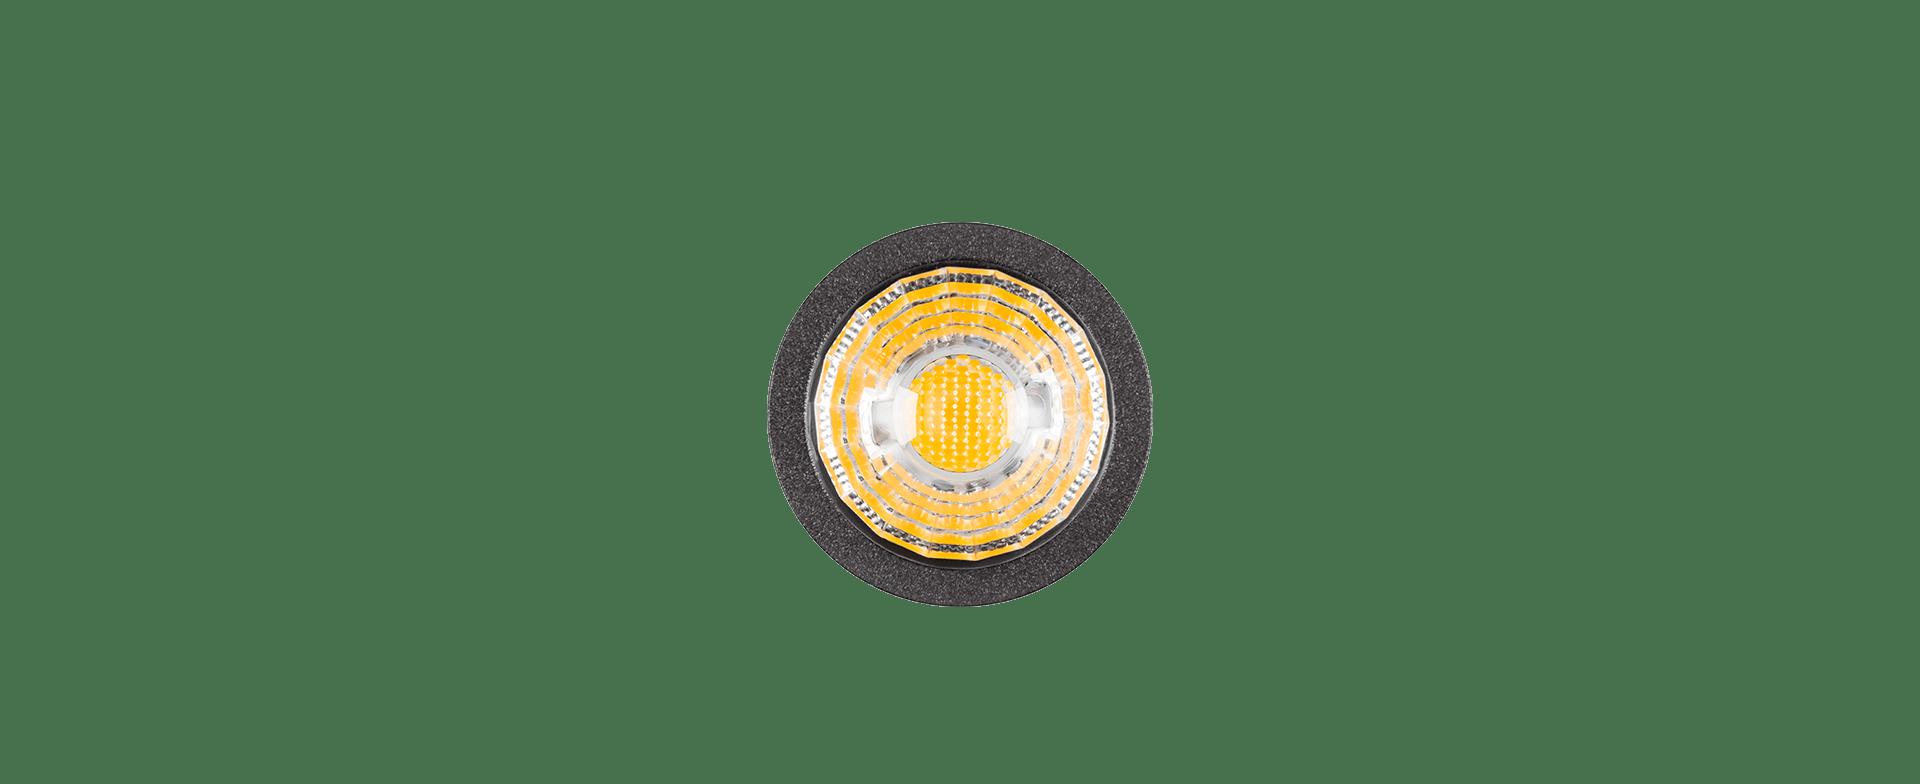 ESPETO LED STELLA STH7702/30 MINI FOCCO 3W 3000K IP67 BIVOLT 66X210MM - PRETO